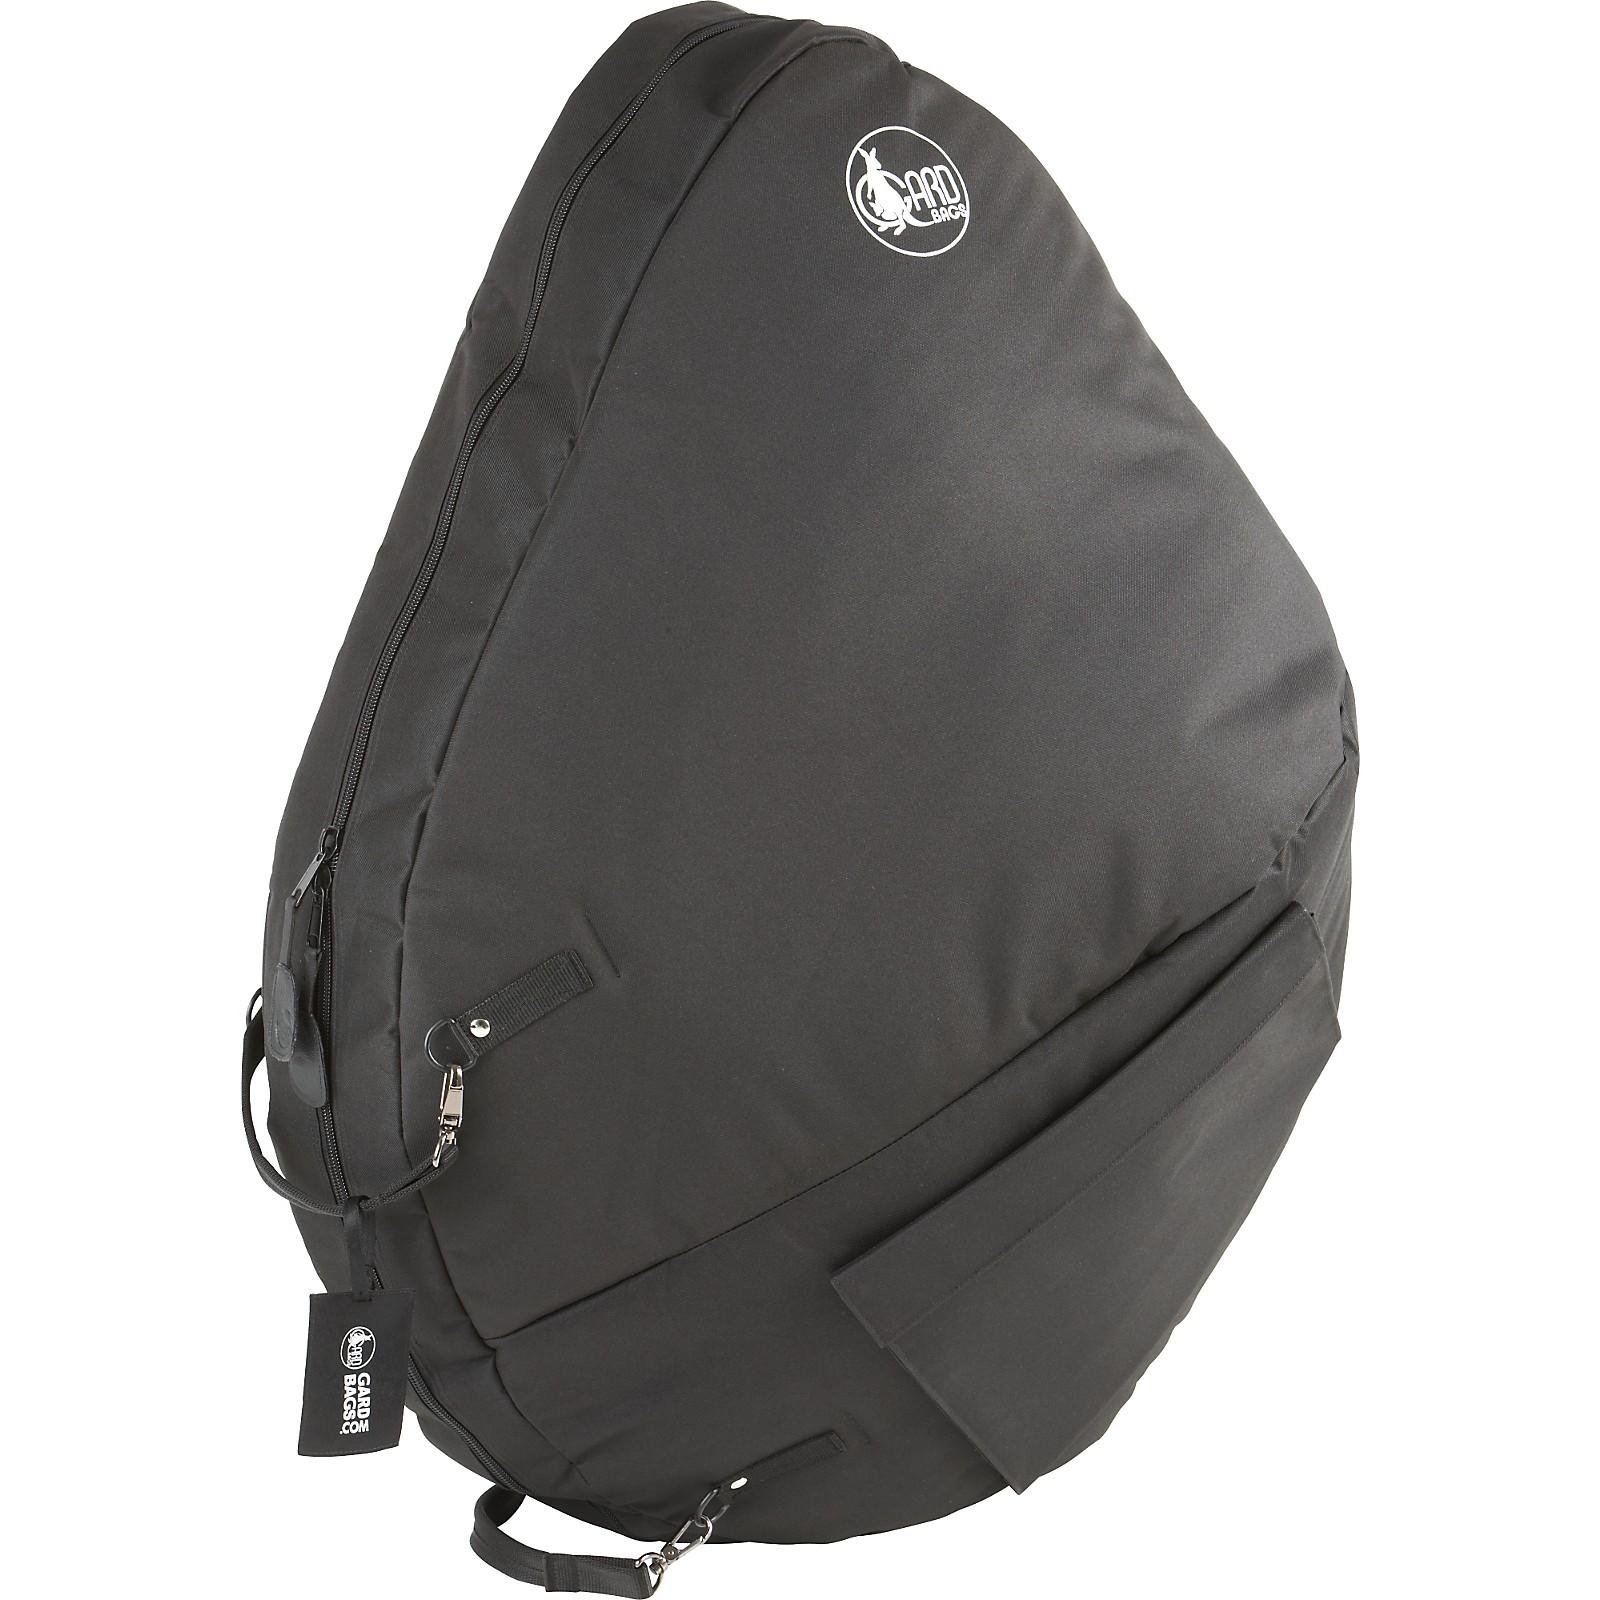 Gard Mid-Suspension Sousaphone Gig Bag